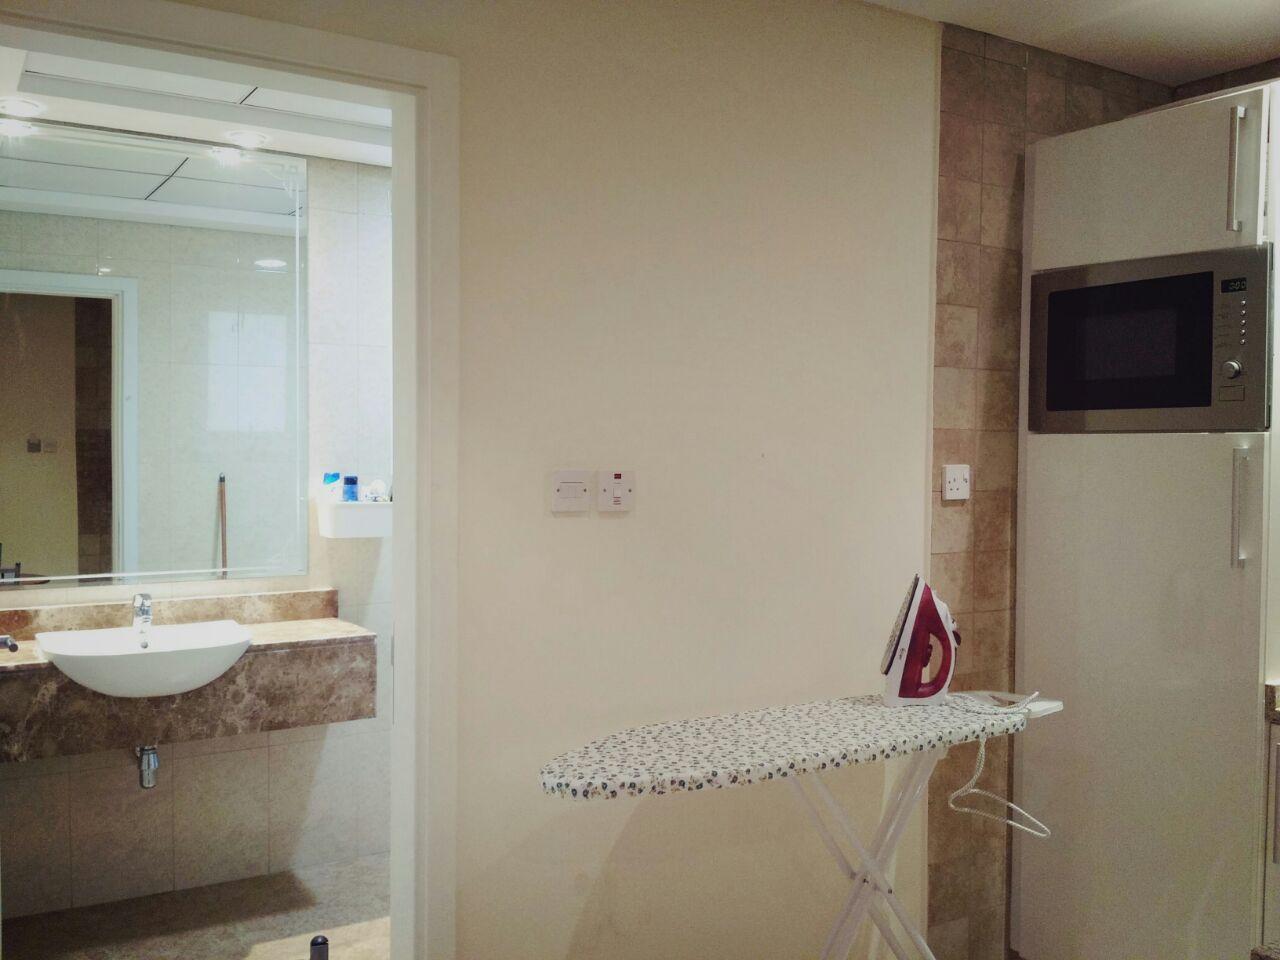 Hostel Beds – Dubai 2